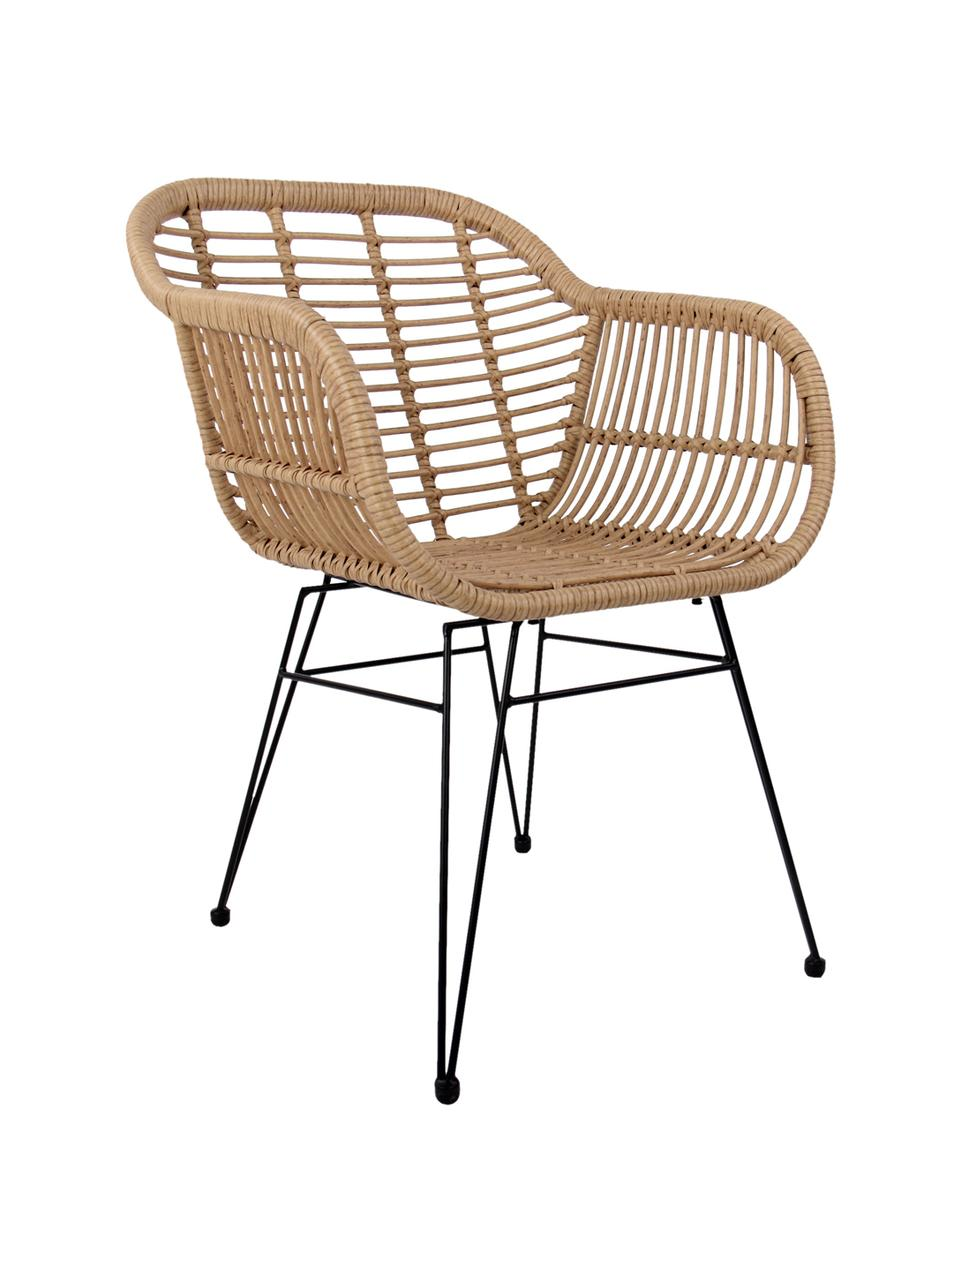 Polyrattan-Armlehnstühle Costa, 2 Stück, Sitzfläche: Polyethylen-Geflecht, Gestell: Metall, pulverbeschichtet, Hellbraun, Schwarz, B 59 x T 58 cm